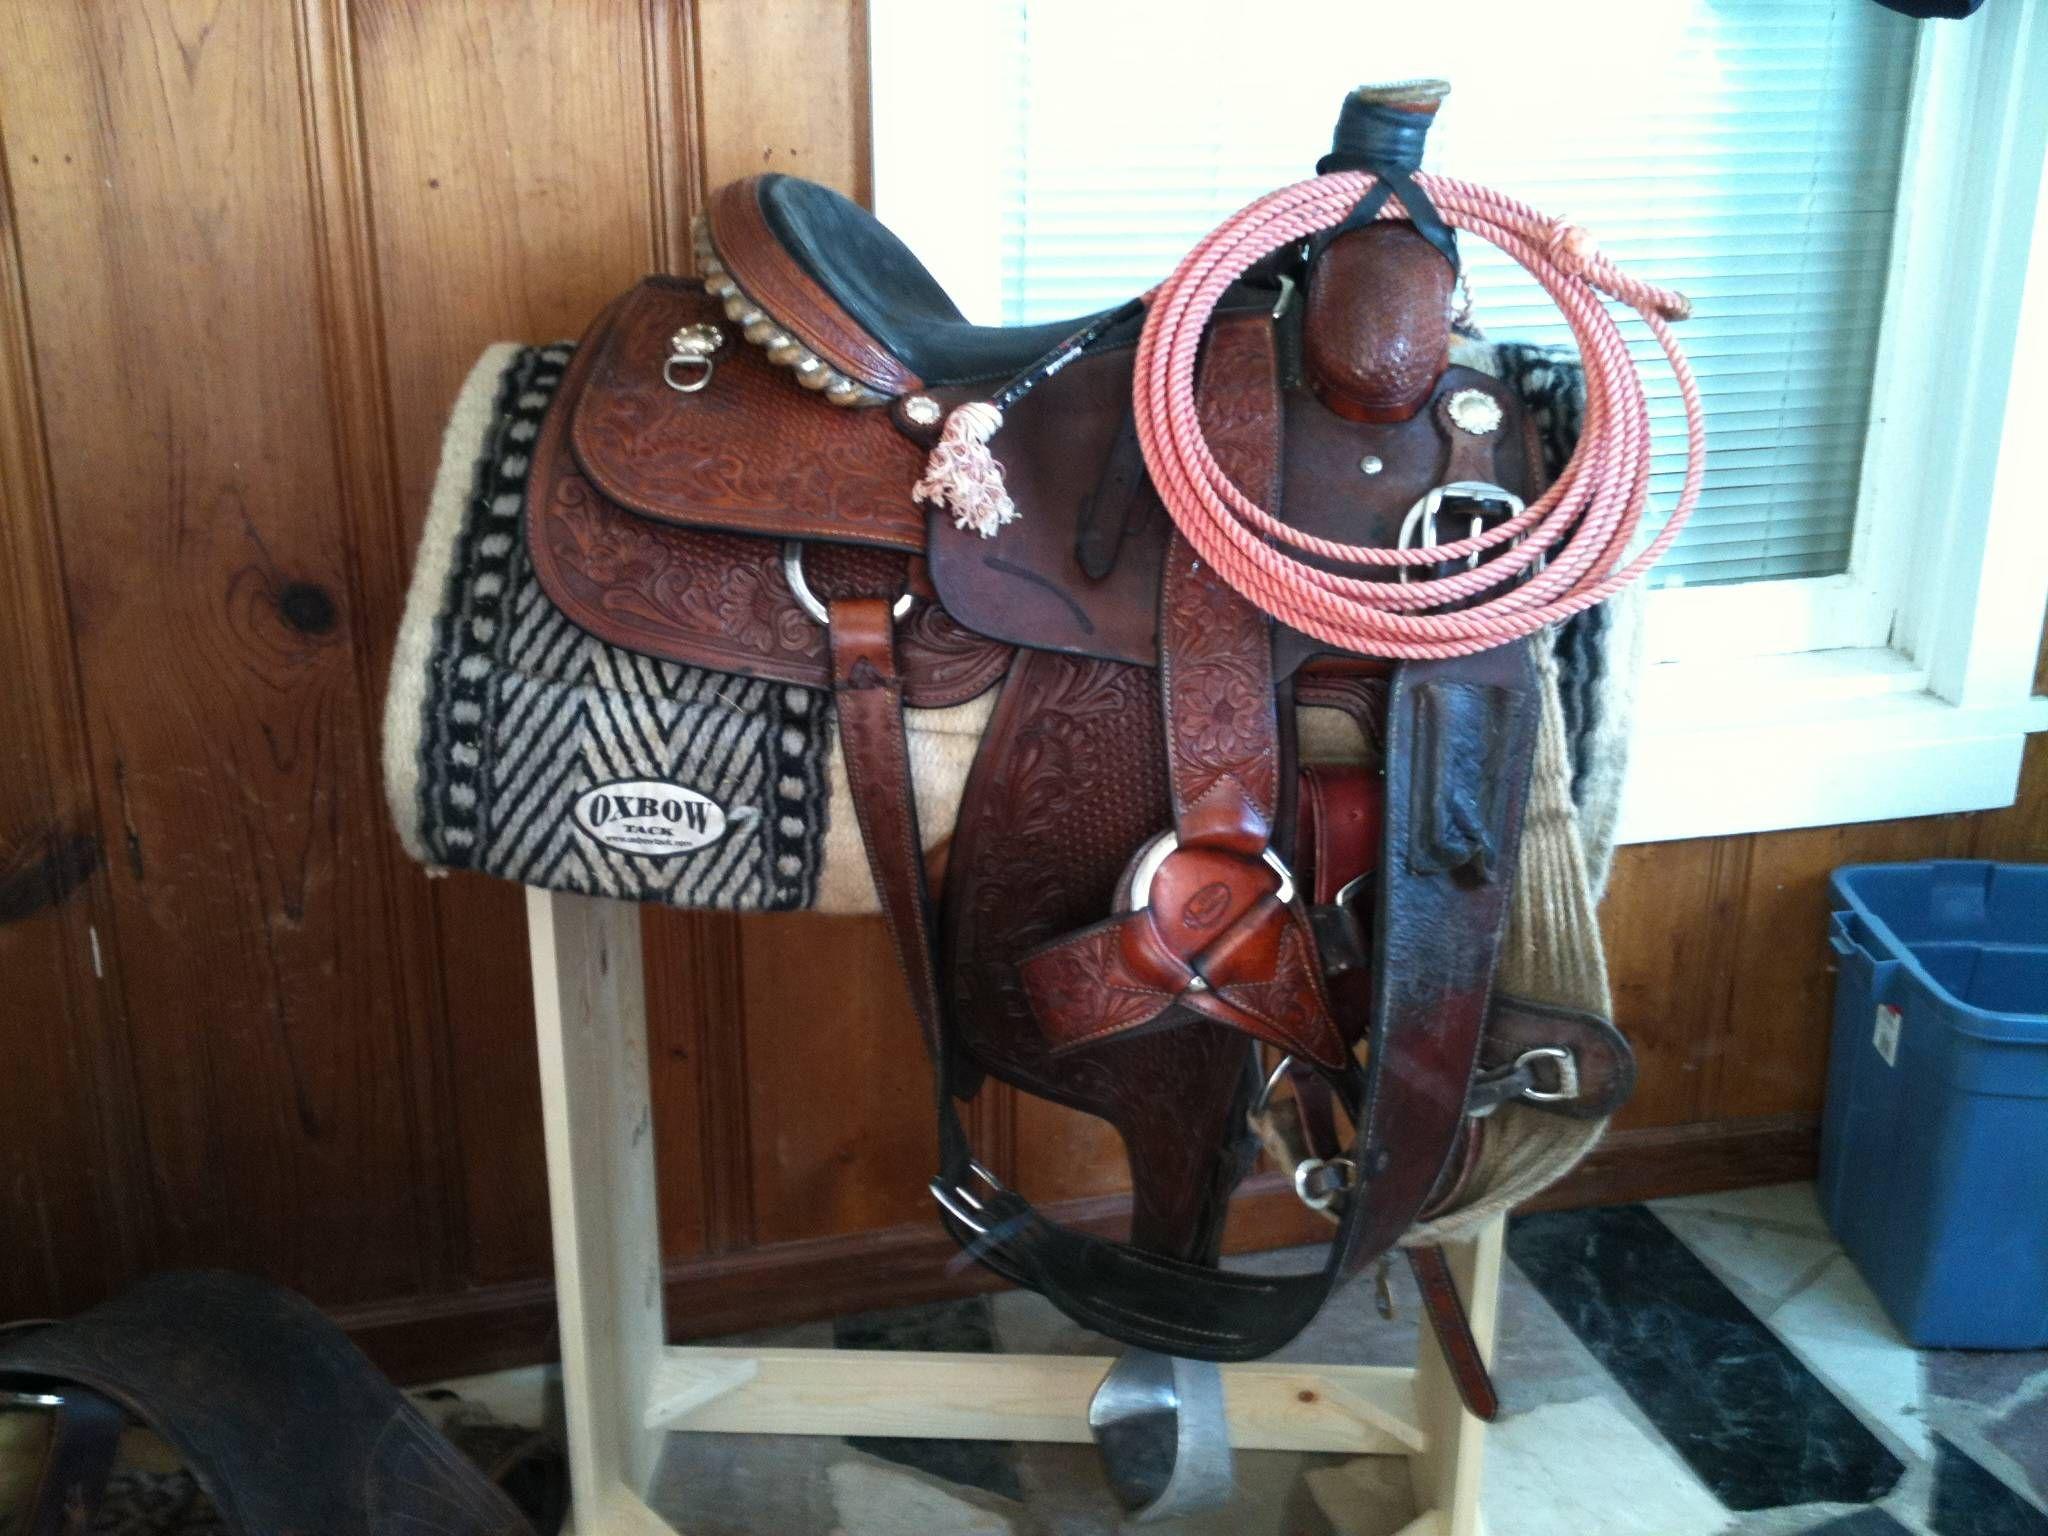 Cactus roping saddle | The barn | Roping saddles, Saddle ...